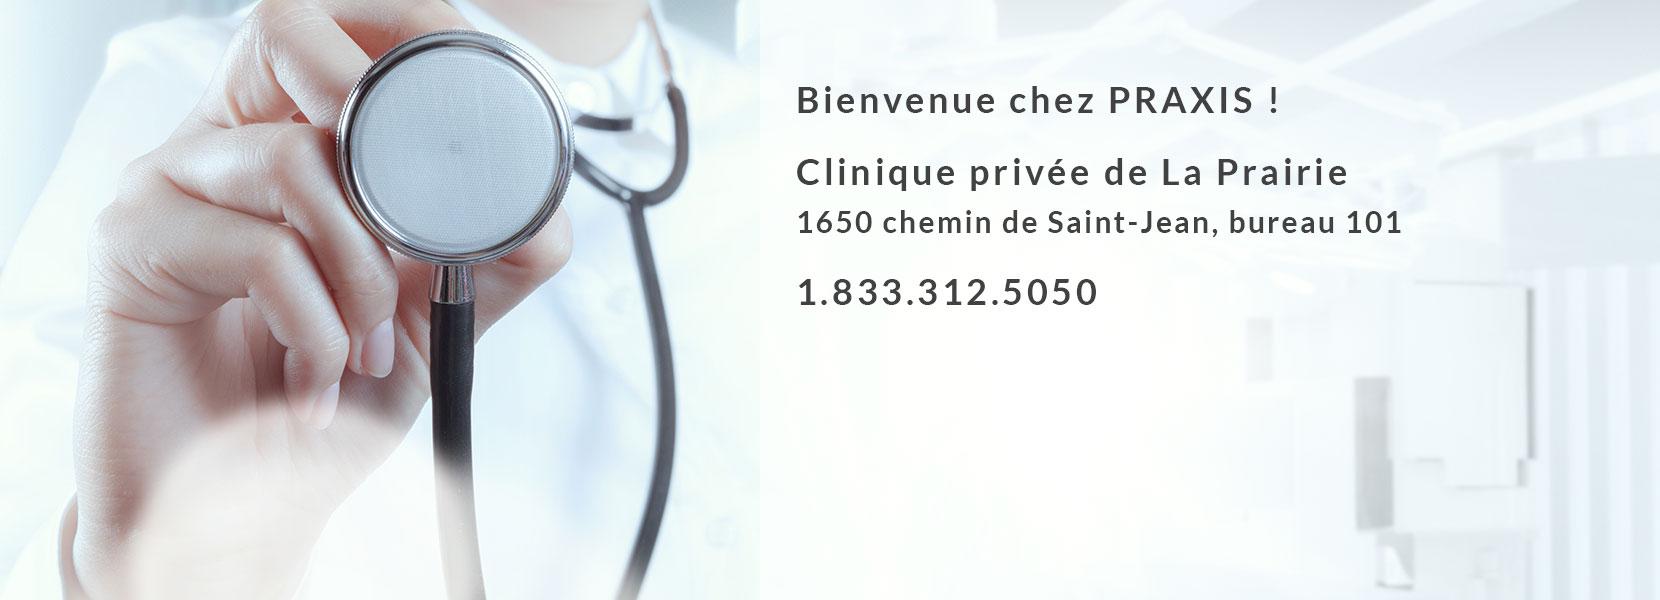 https://cliniquepraxis.ca/wp-content/uploads/2019/09/PraxisLaPrairie_Entete_SiteWeb-1.jpg